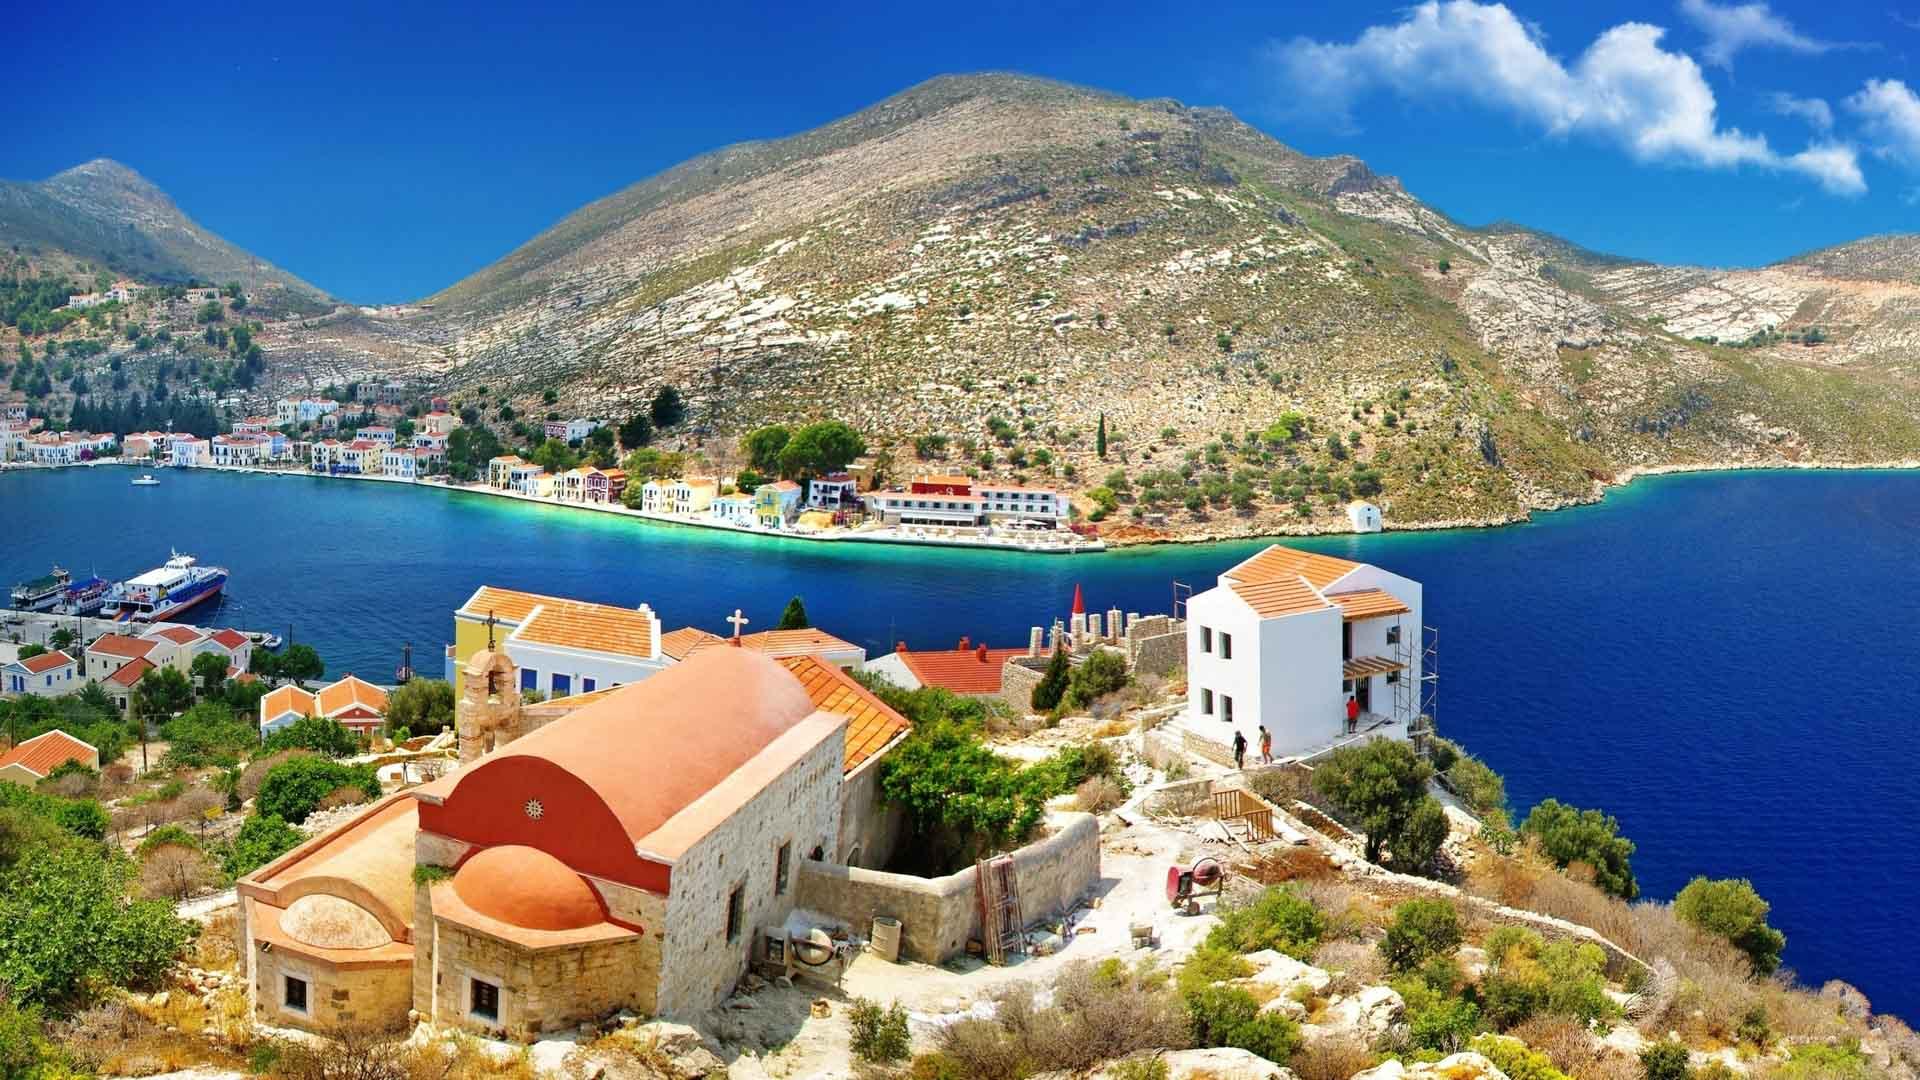 Greece Beach Wallpaper: Greece HD Wallpapers